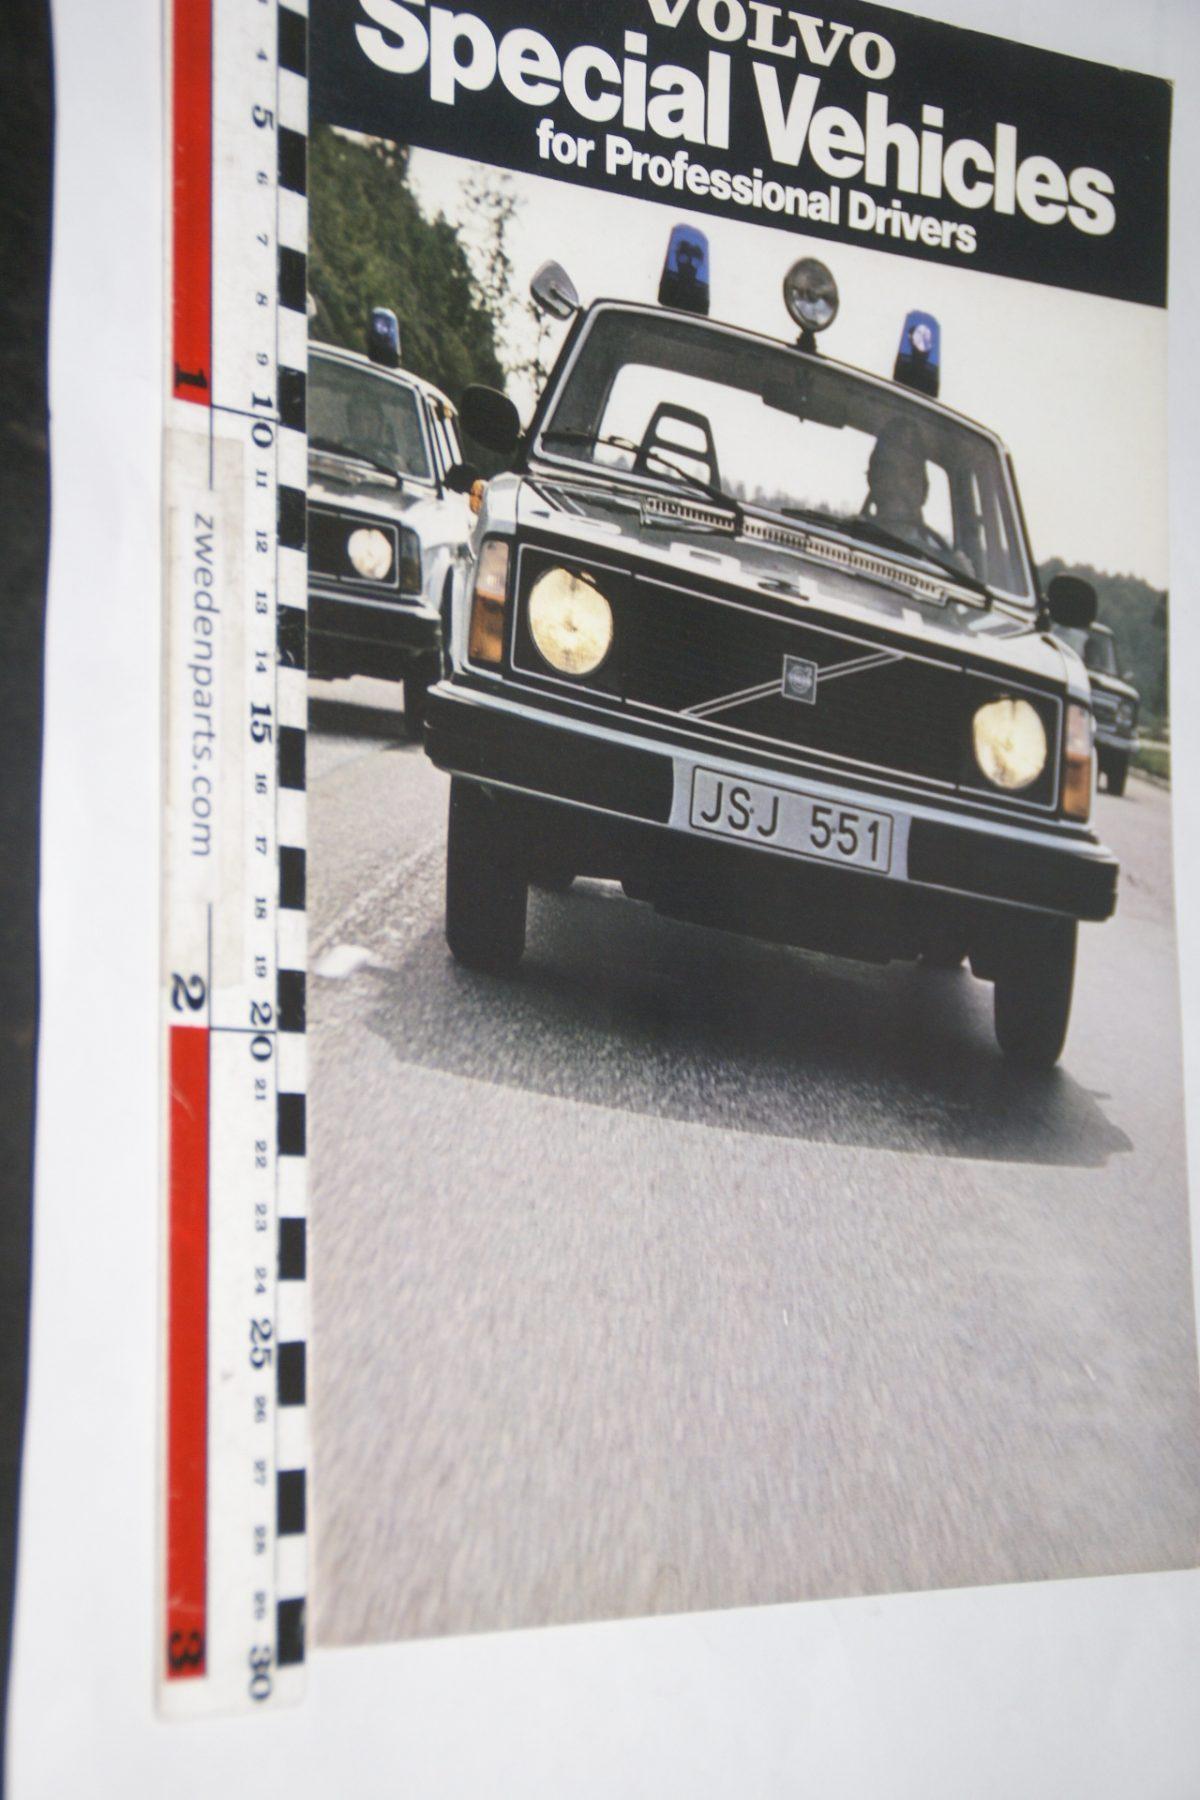 DSC05561 1978 brochure Volvo 240 Special Vehicules nr ASP-PV 5443 Engels